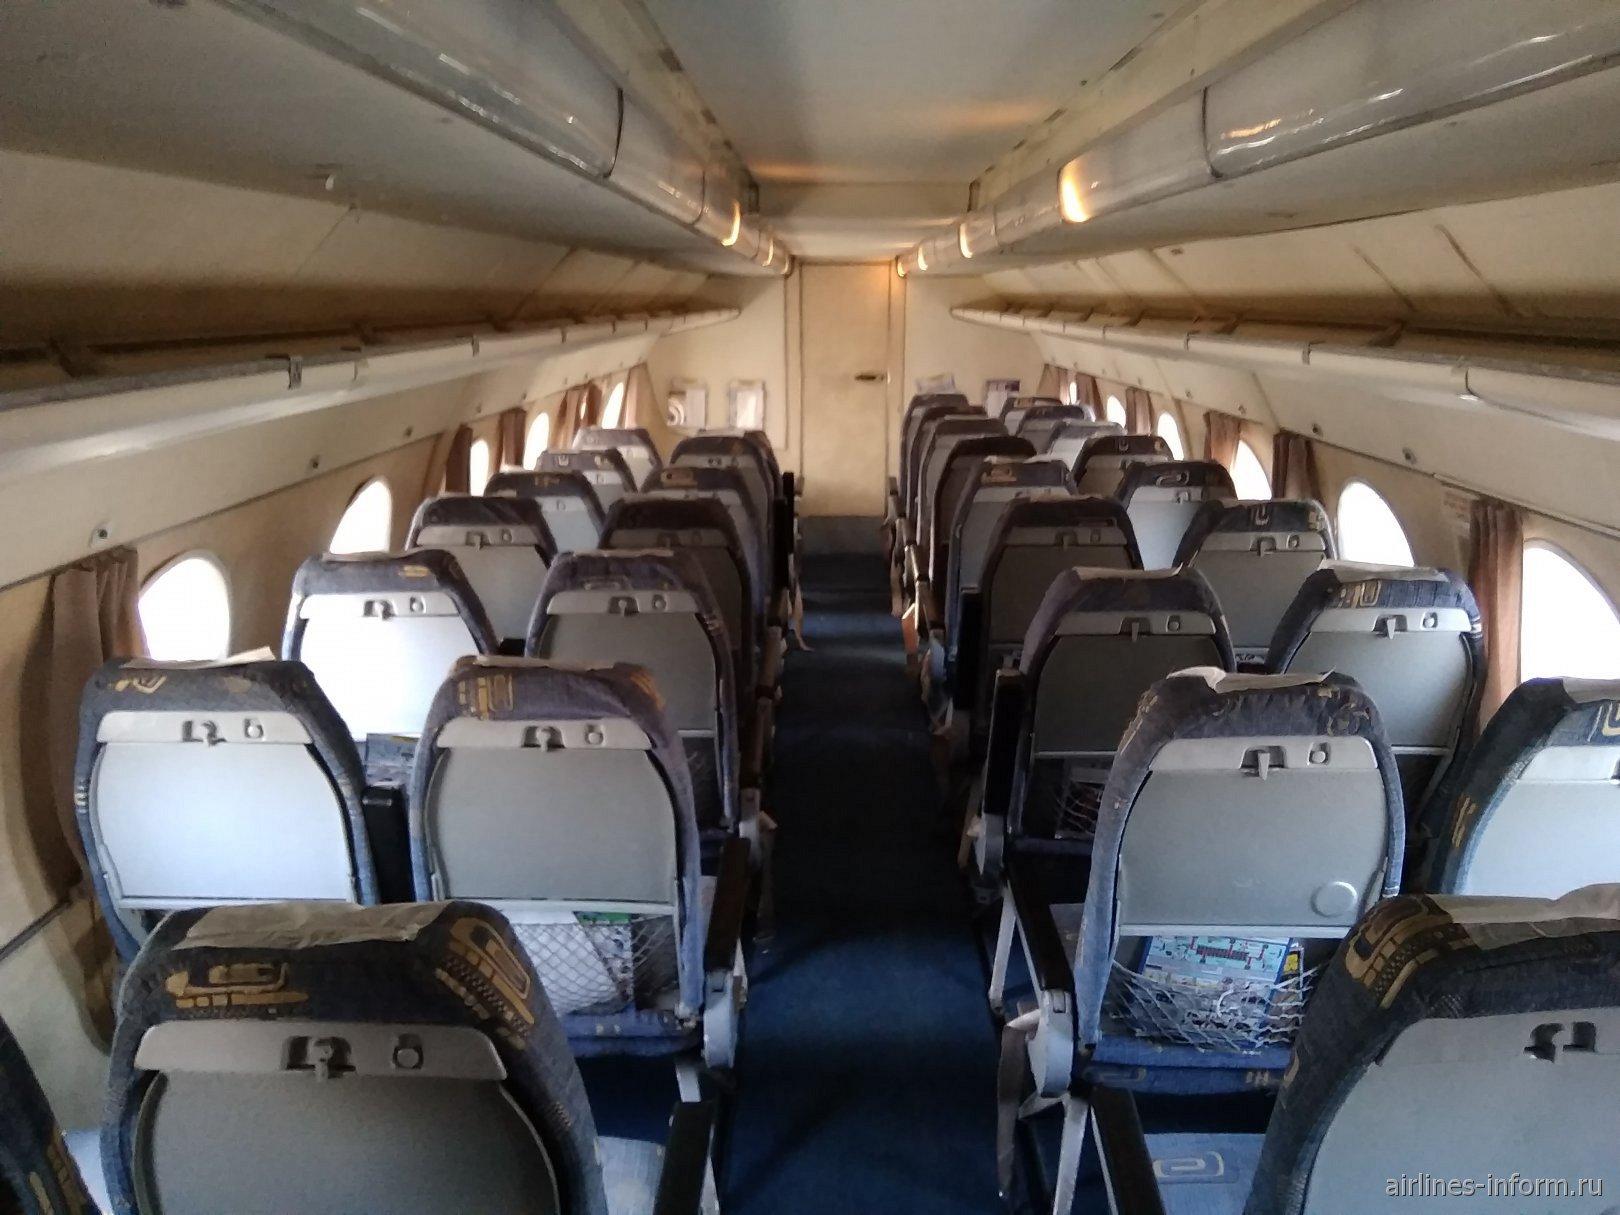 Пассажирский салон самолета Ан-24 авиакомпании Сириус-Аэро